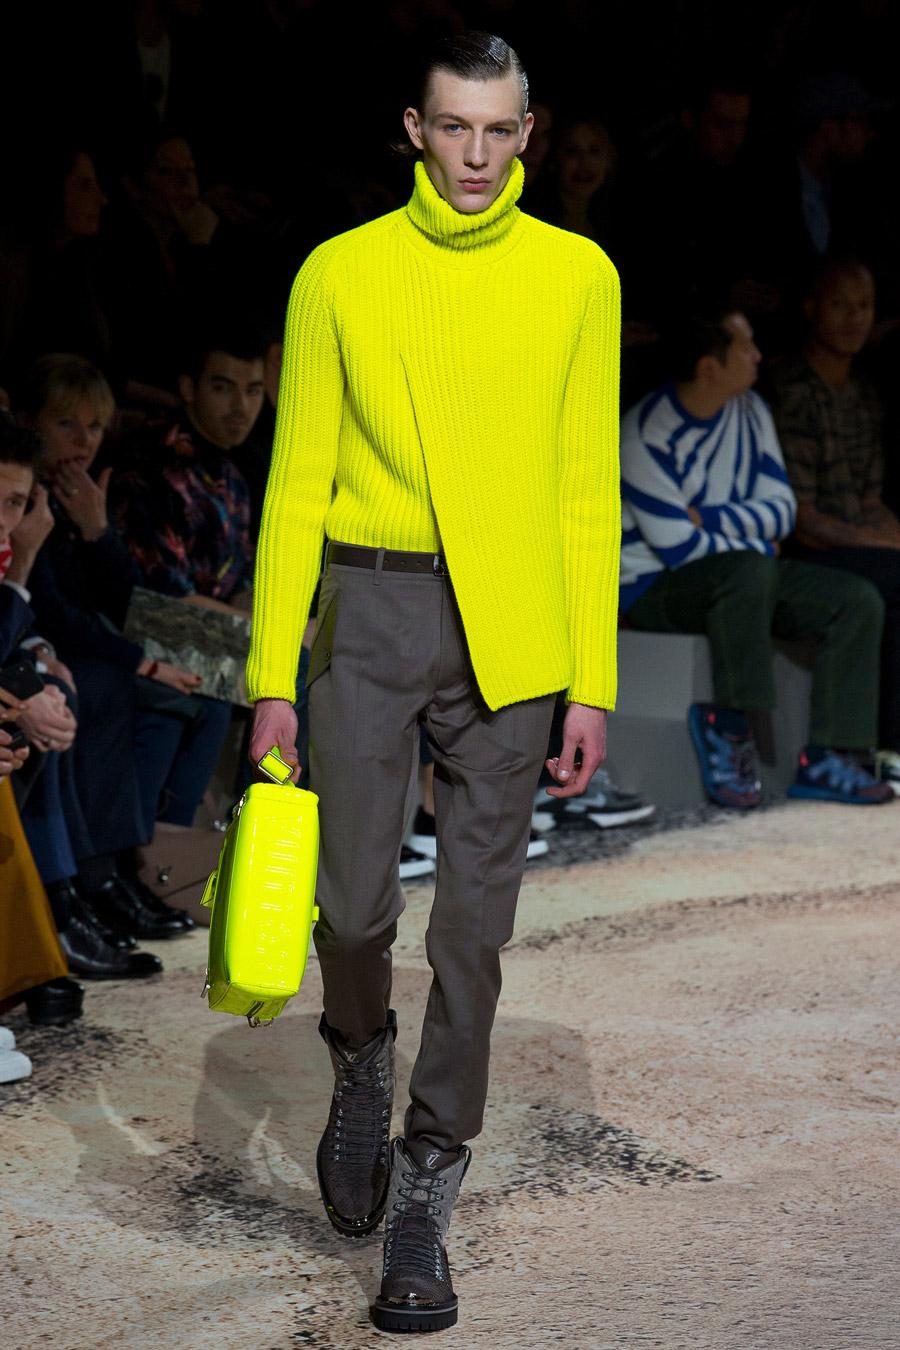 Louis Vuitton FW18 Menswear